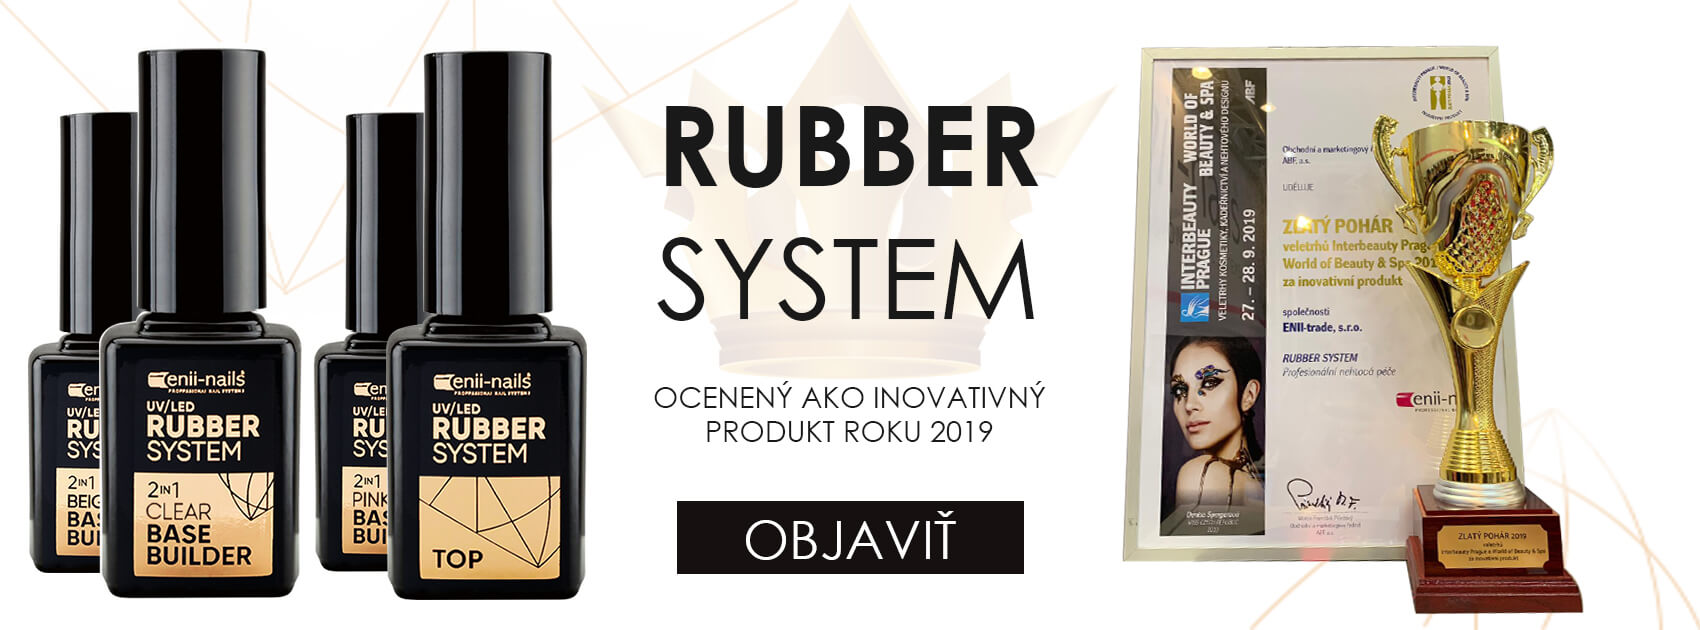 Novinka Rubber System